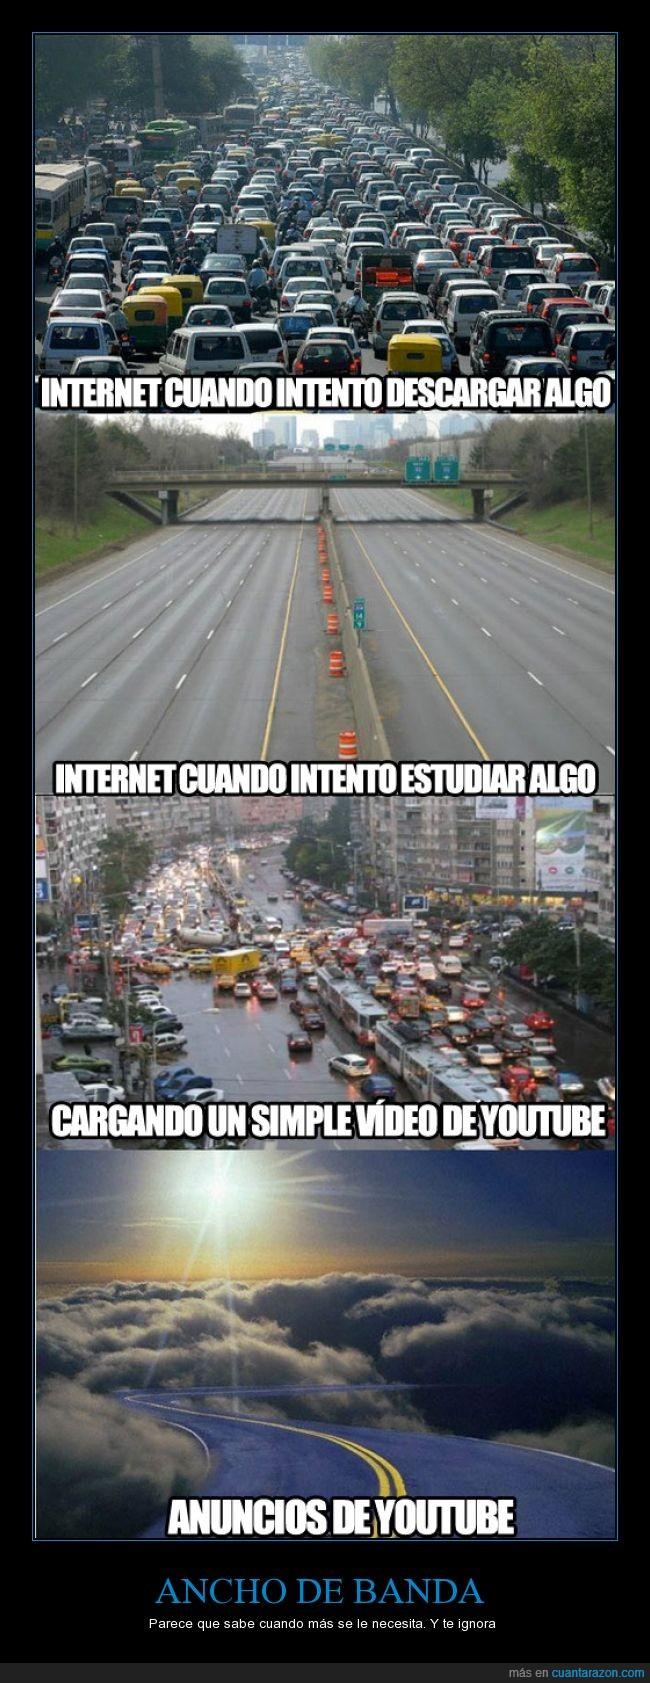 anuncio,conexion,descarga,estudiar,lento,normal,rapido,velocidad,youtube